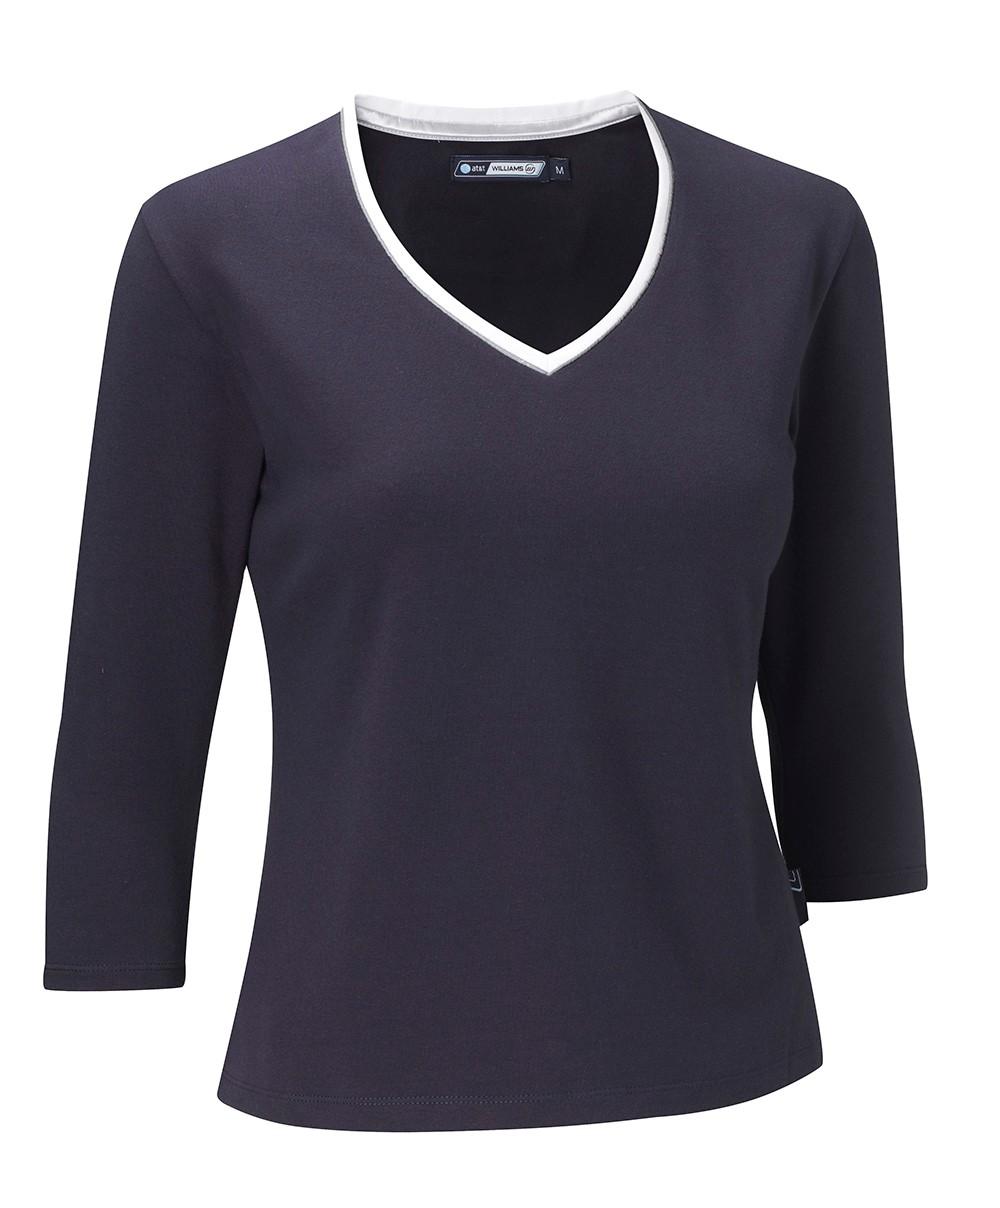 t shirt formel formula one 1 at t williams f1 team neu partner damen de s ebay. Black Bedroom Furniture Sets. Home Design Ideas